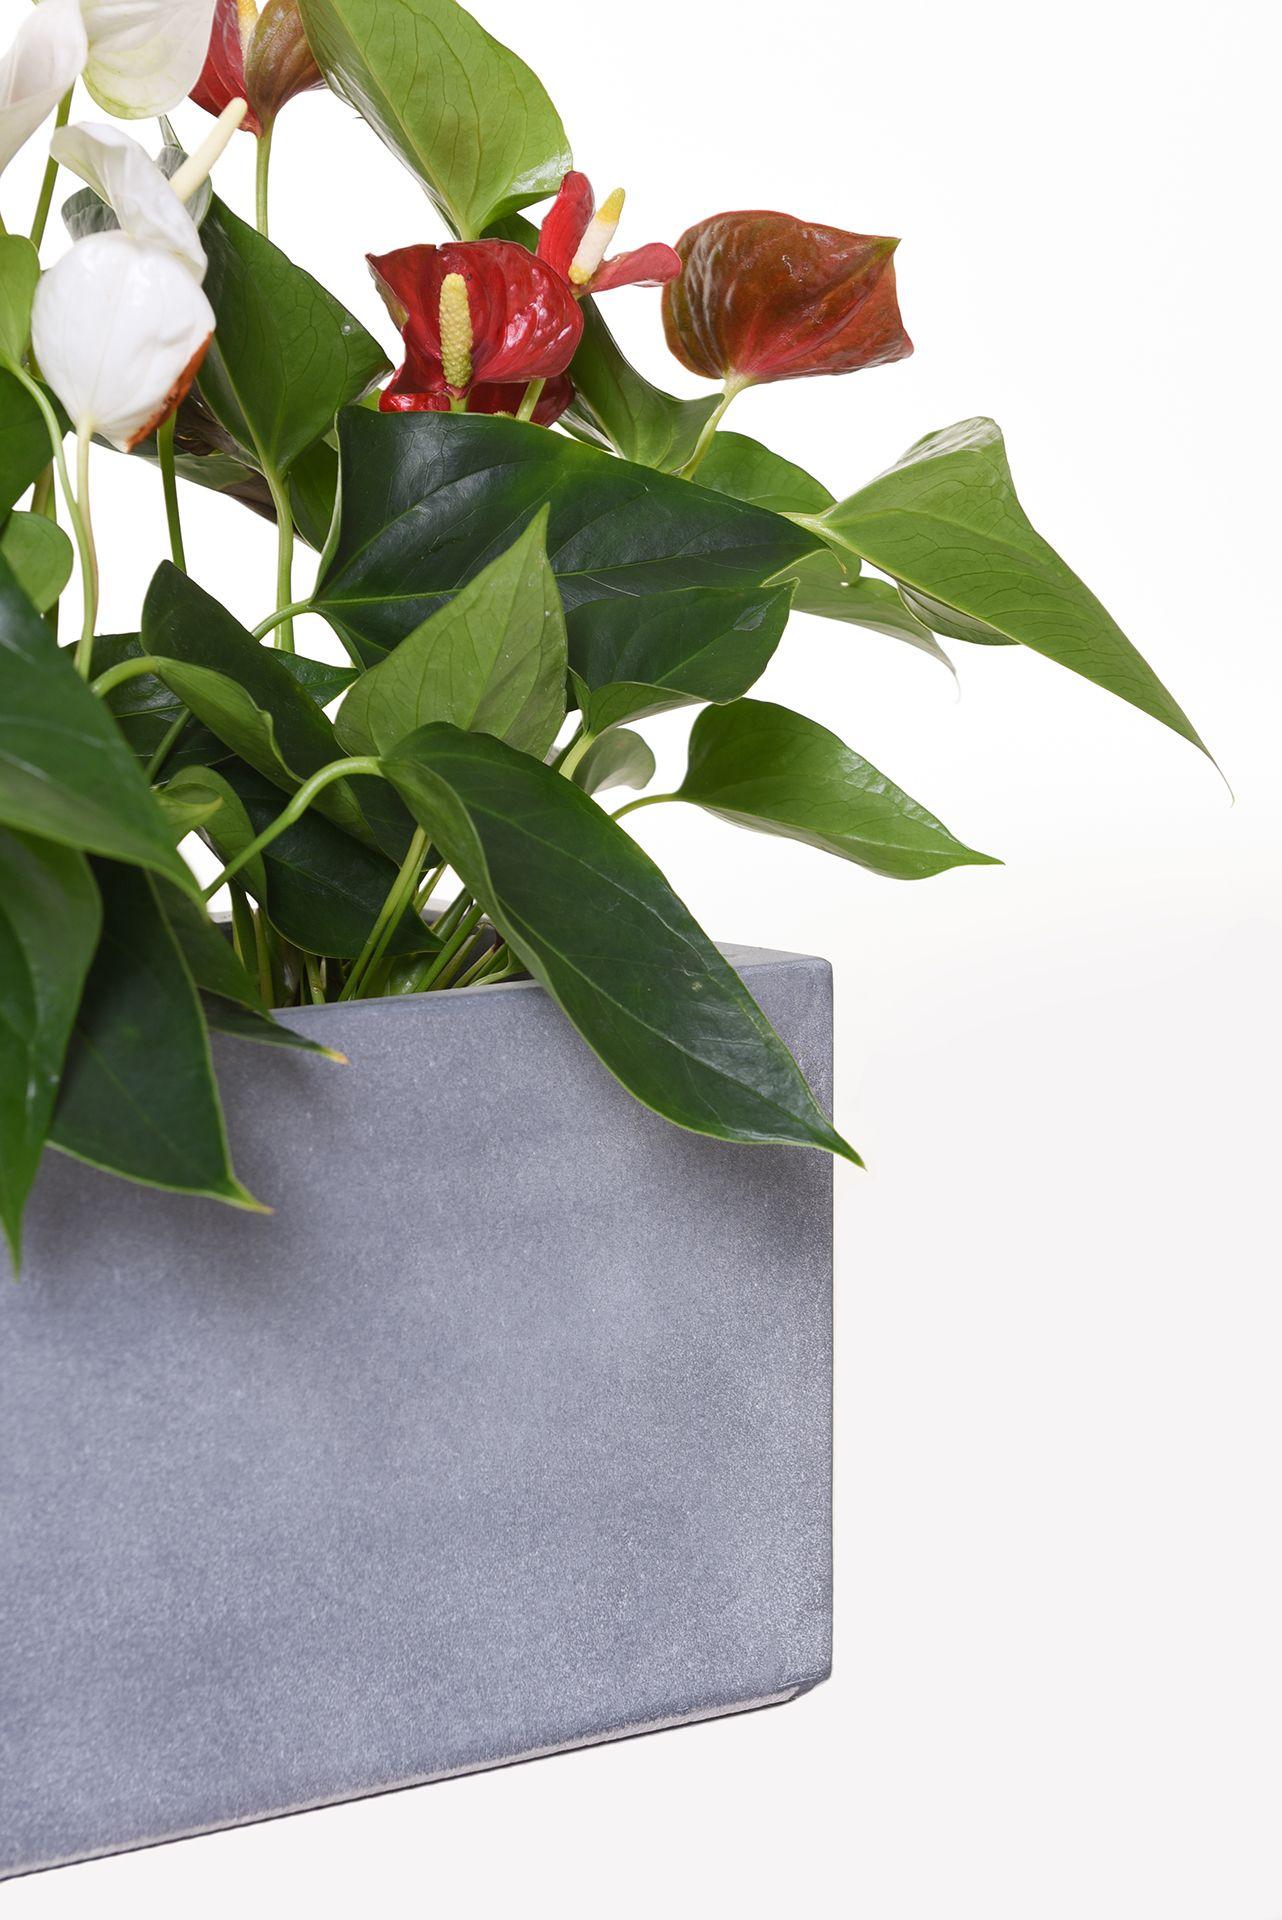 blumenkasten balkonkasten pflanzkasten aus beton flobo 60 cm grau ebay. Black Bedroom Furniture Sets. Home Design Ideas